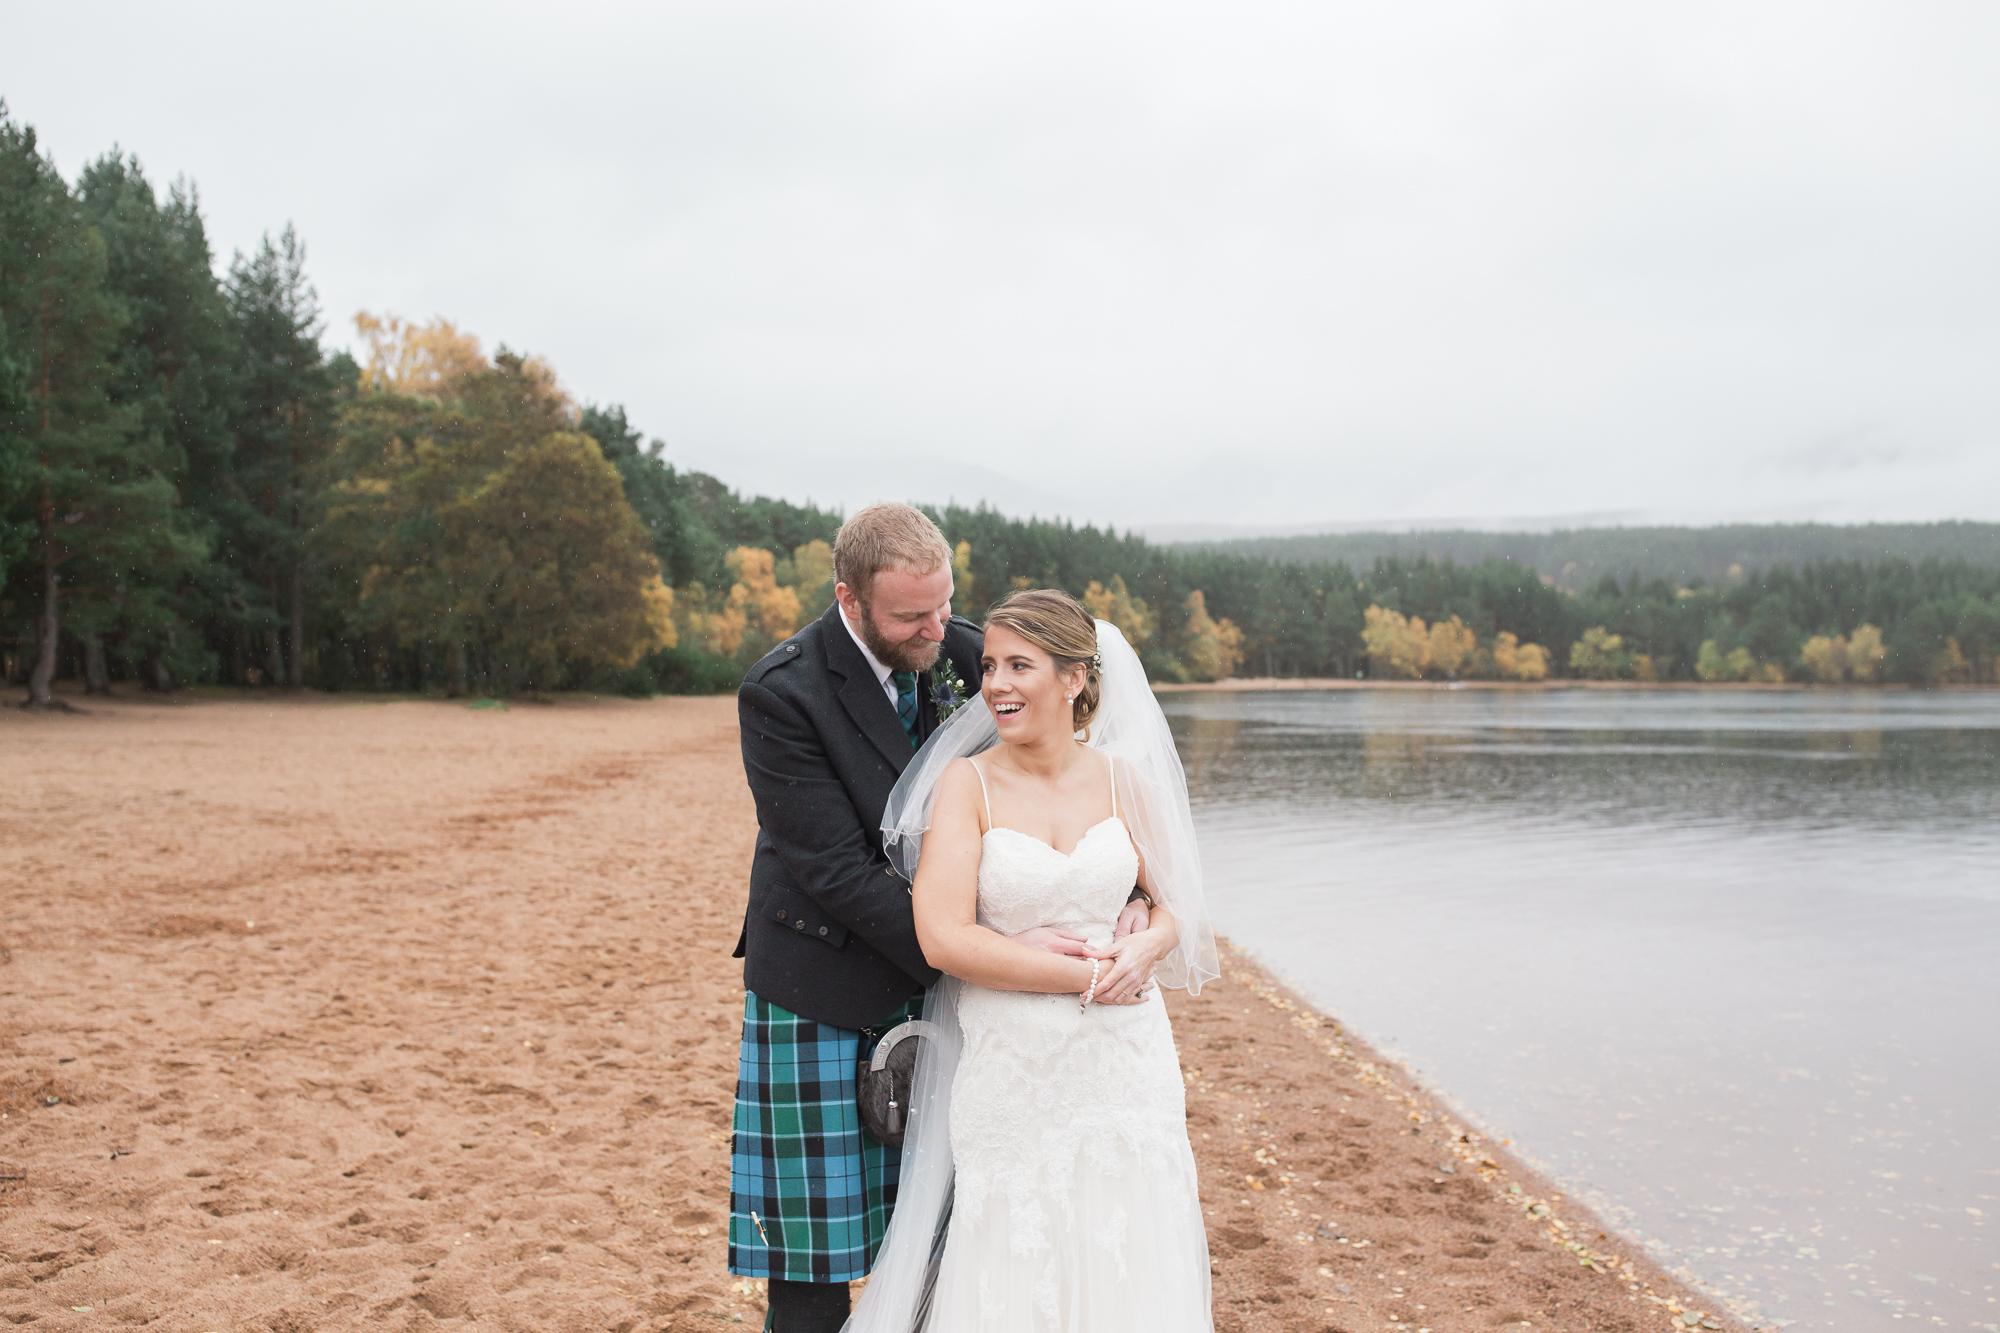 weddingphotographeraberdeen (23 of 17).jpg